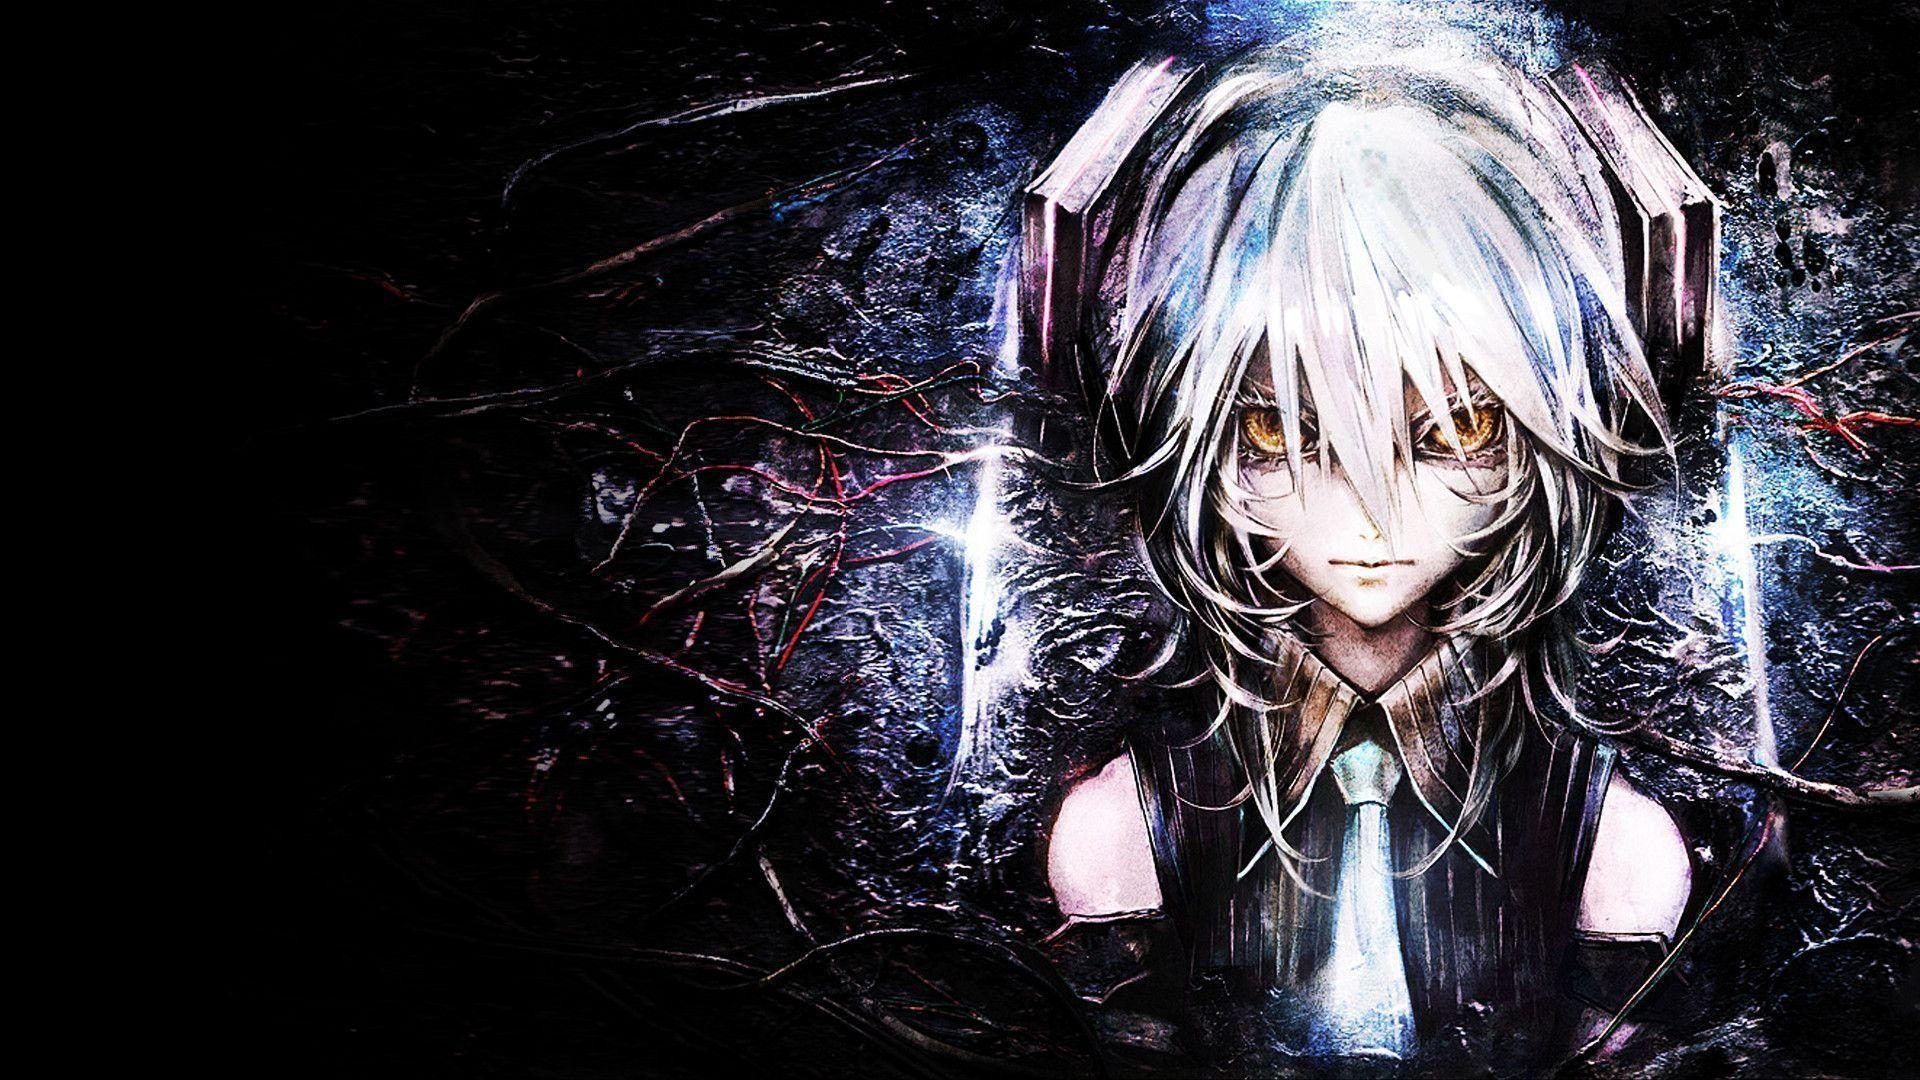 Dark Anime Wallpaper HD (66+ images)